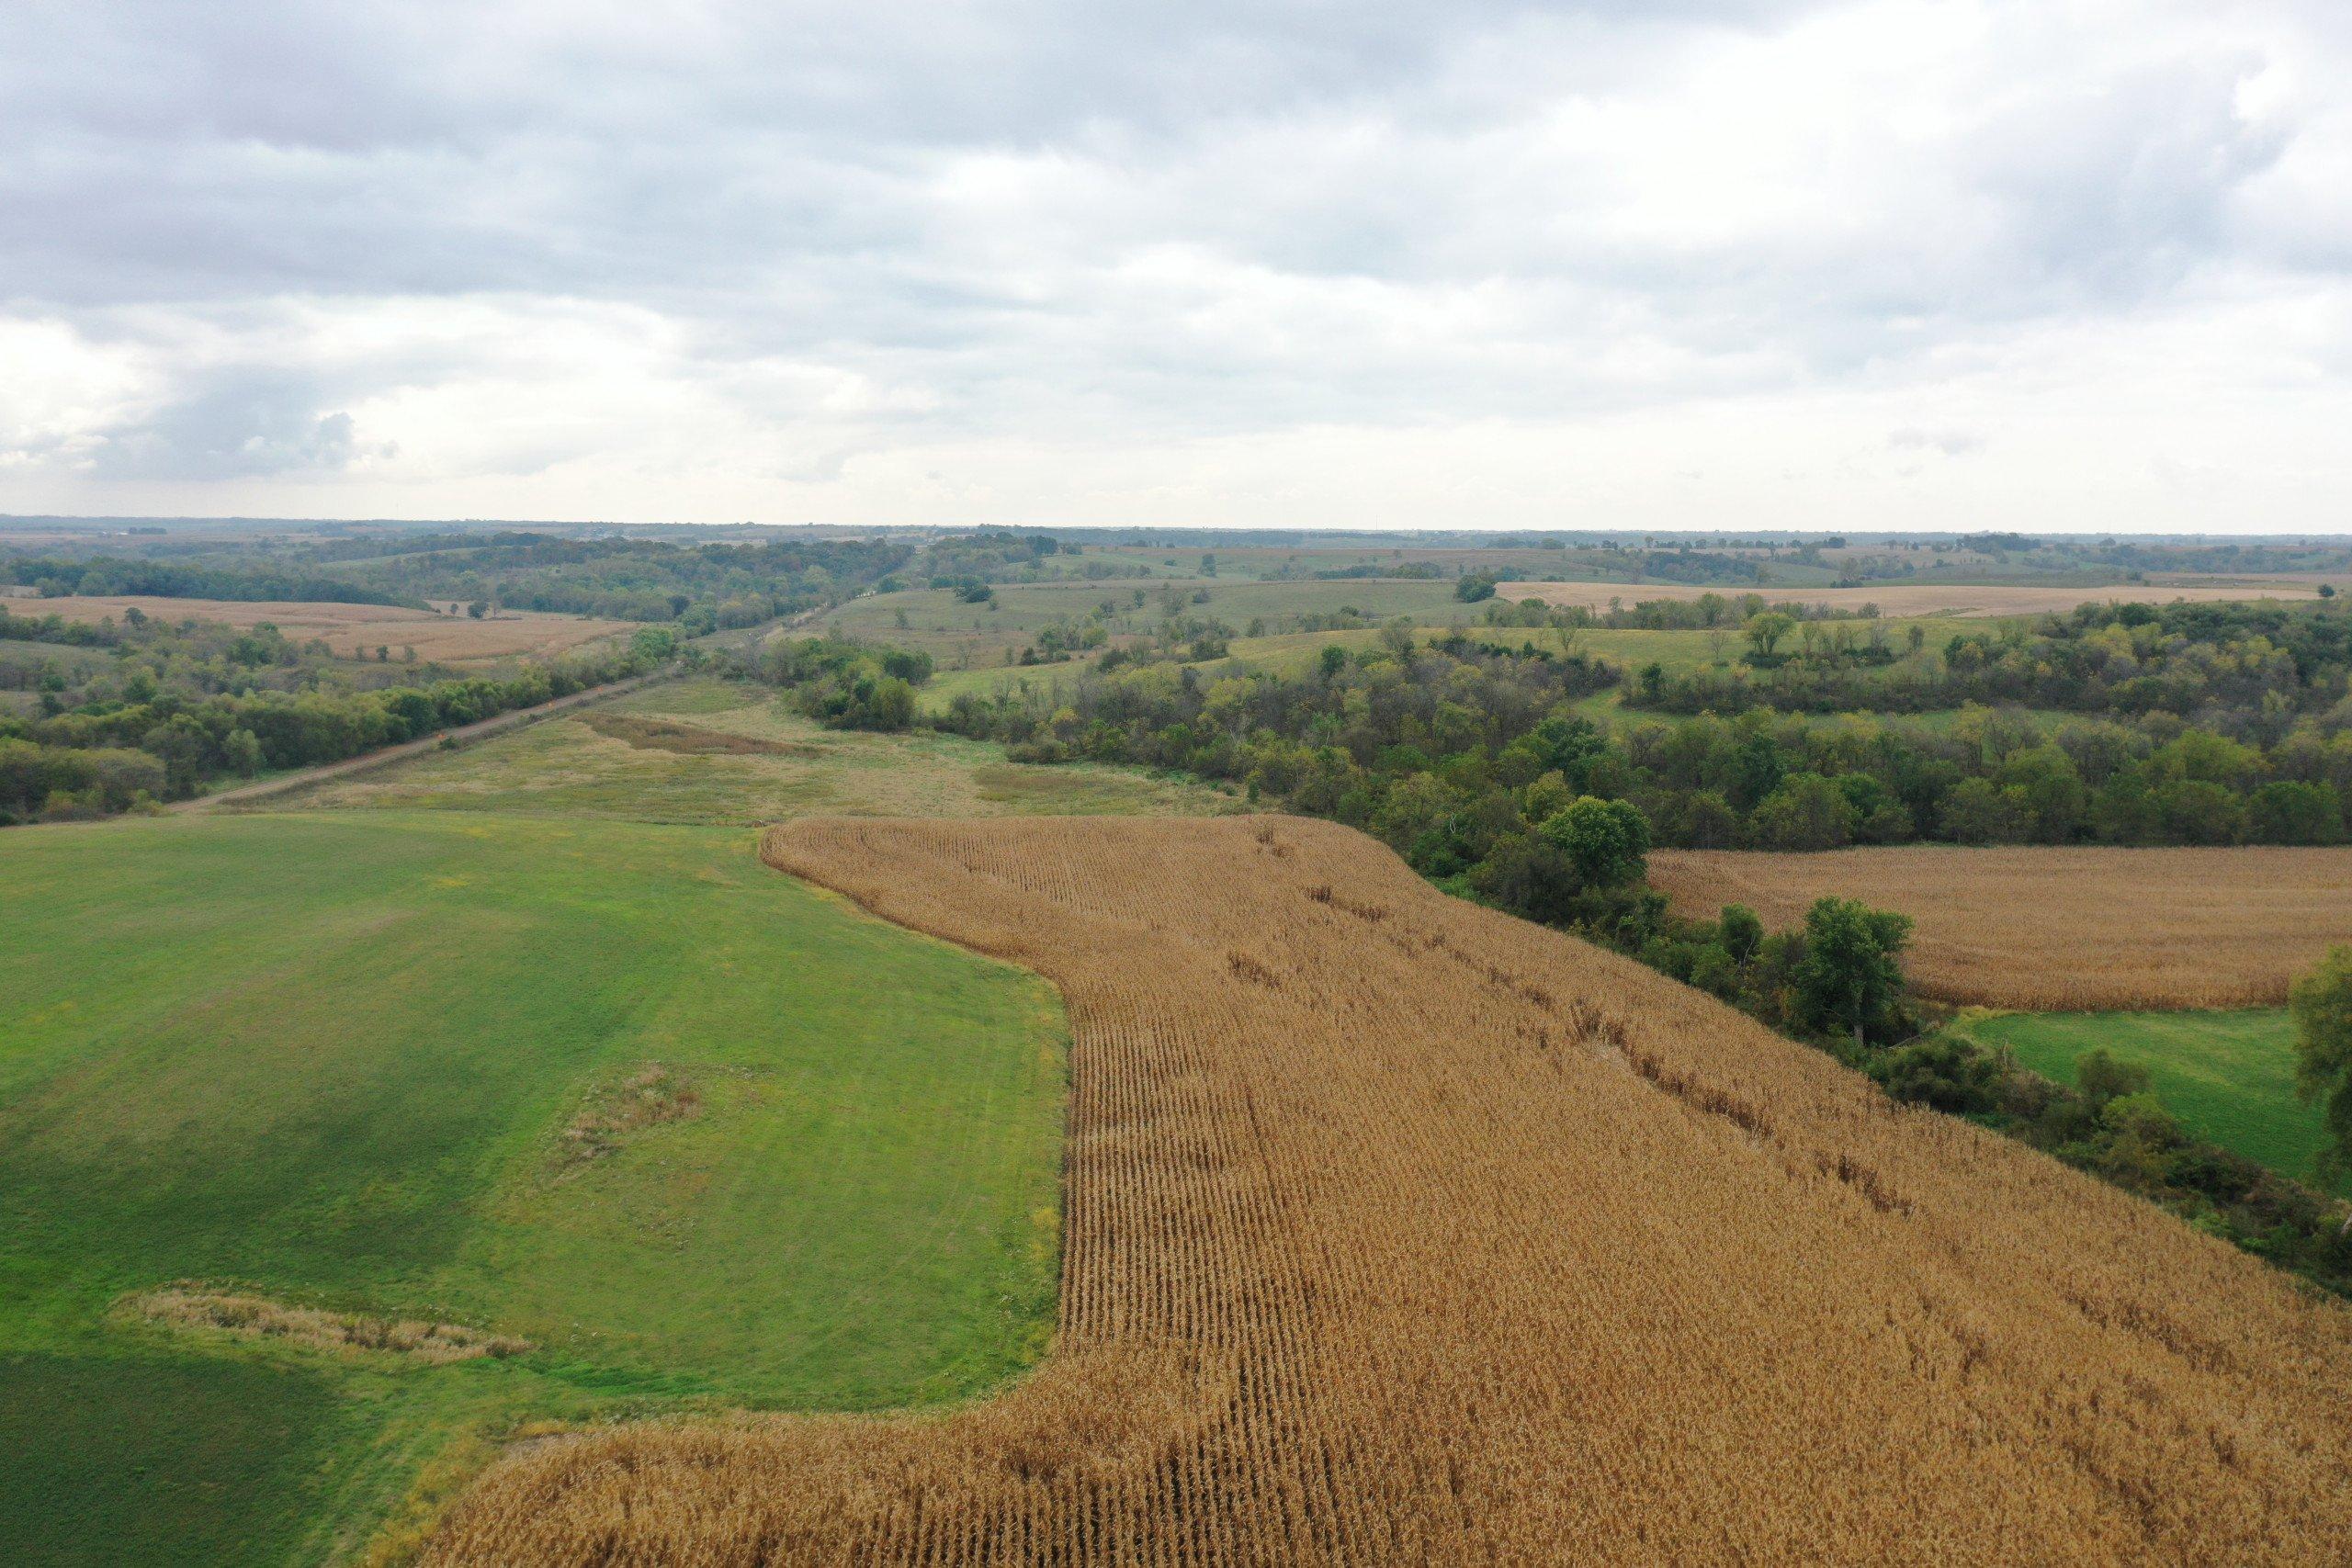 land-warren-county-iowa-200-acres-listing-number-15810-DJI_0578-1.jpg